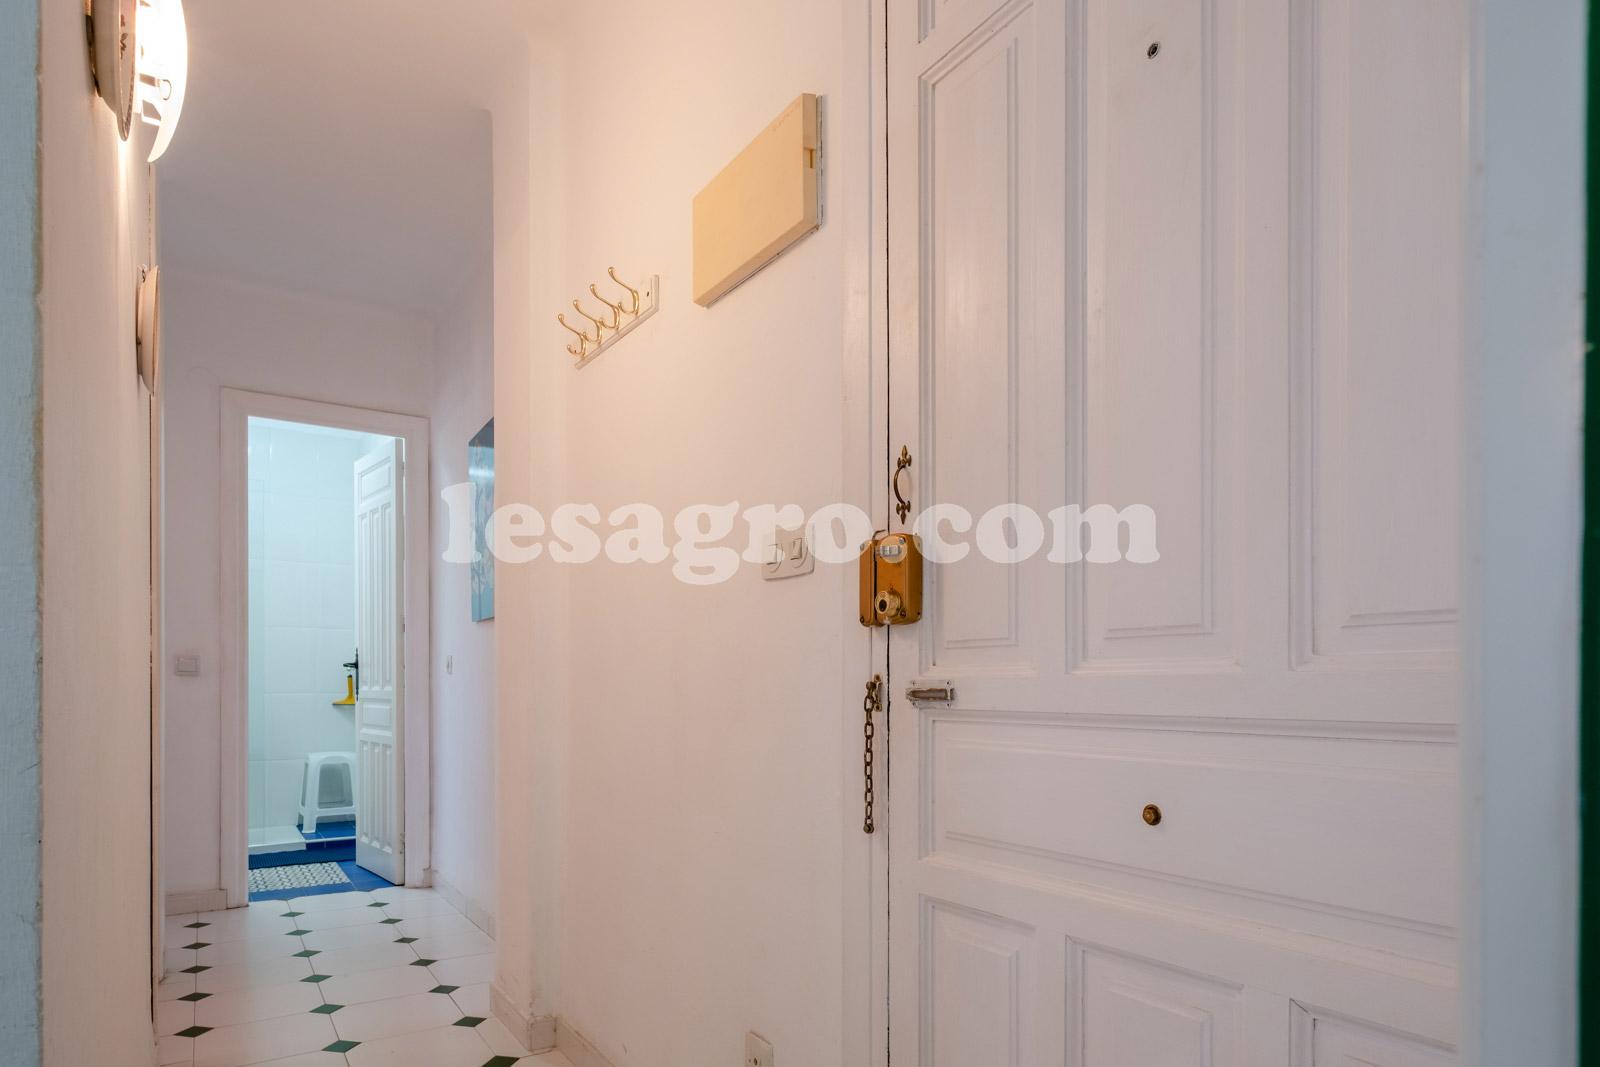 apartment for sale on oasis de capistrano - Lesagro.com